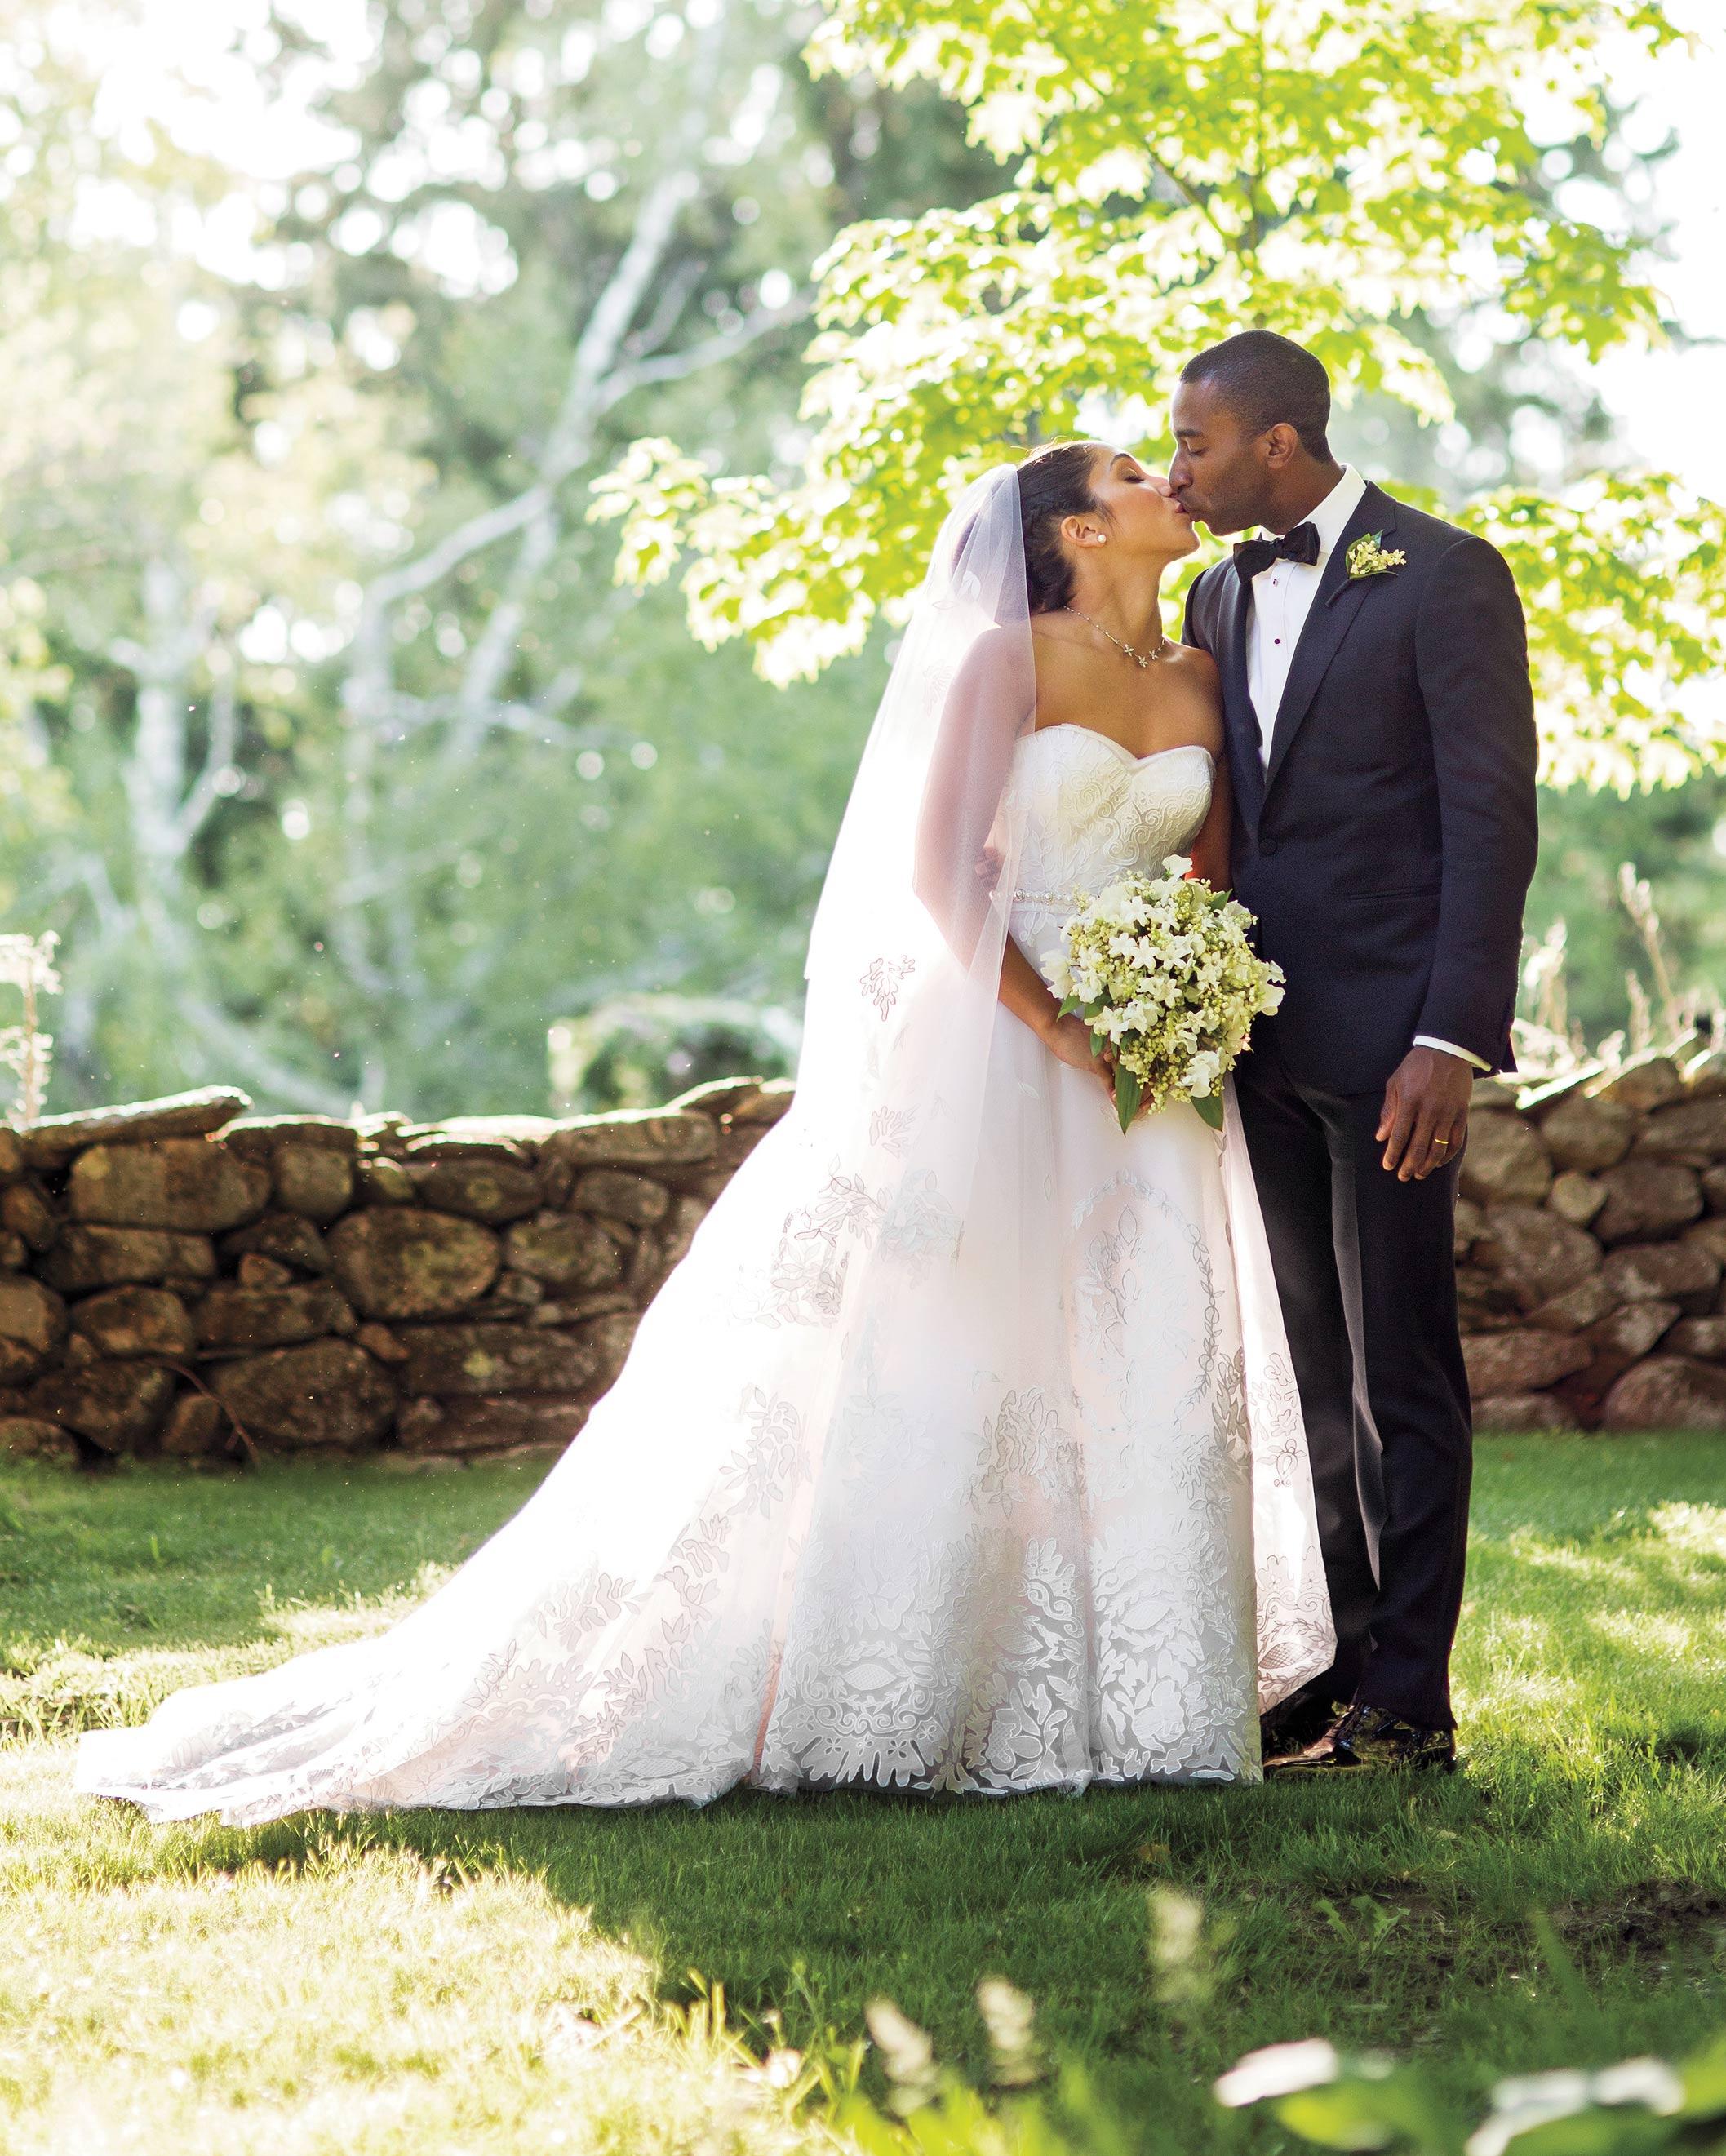 mhonor-jay-wedding-connecticut-first-look-0968-d112238.jpg